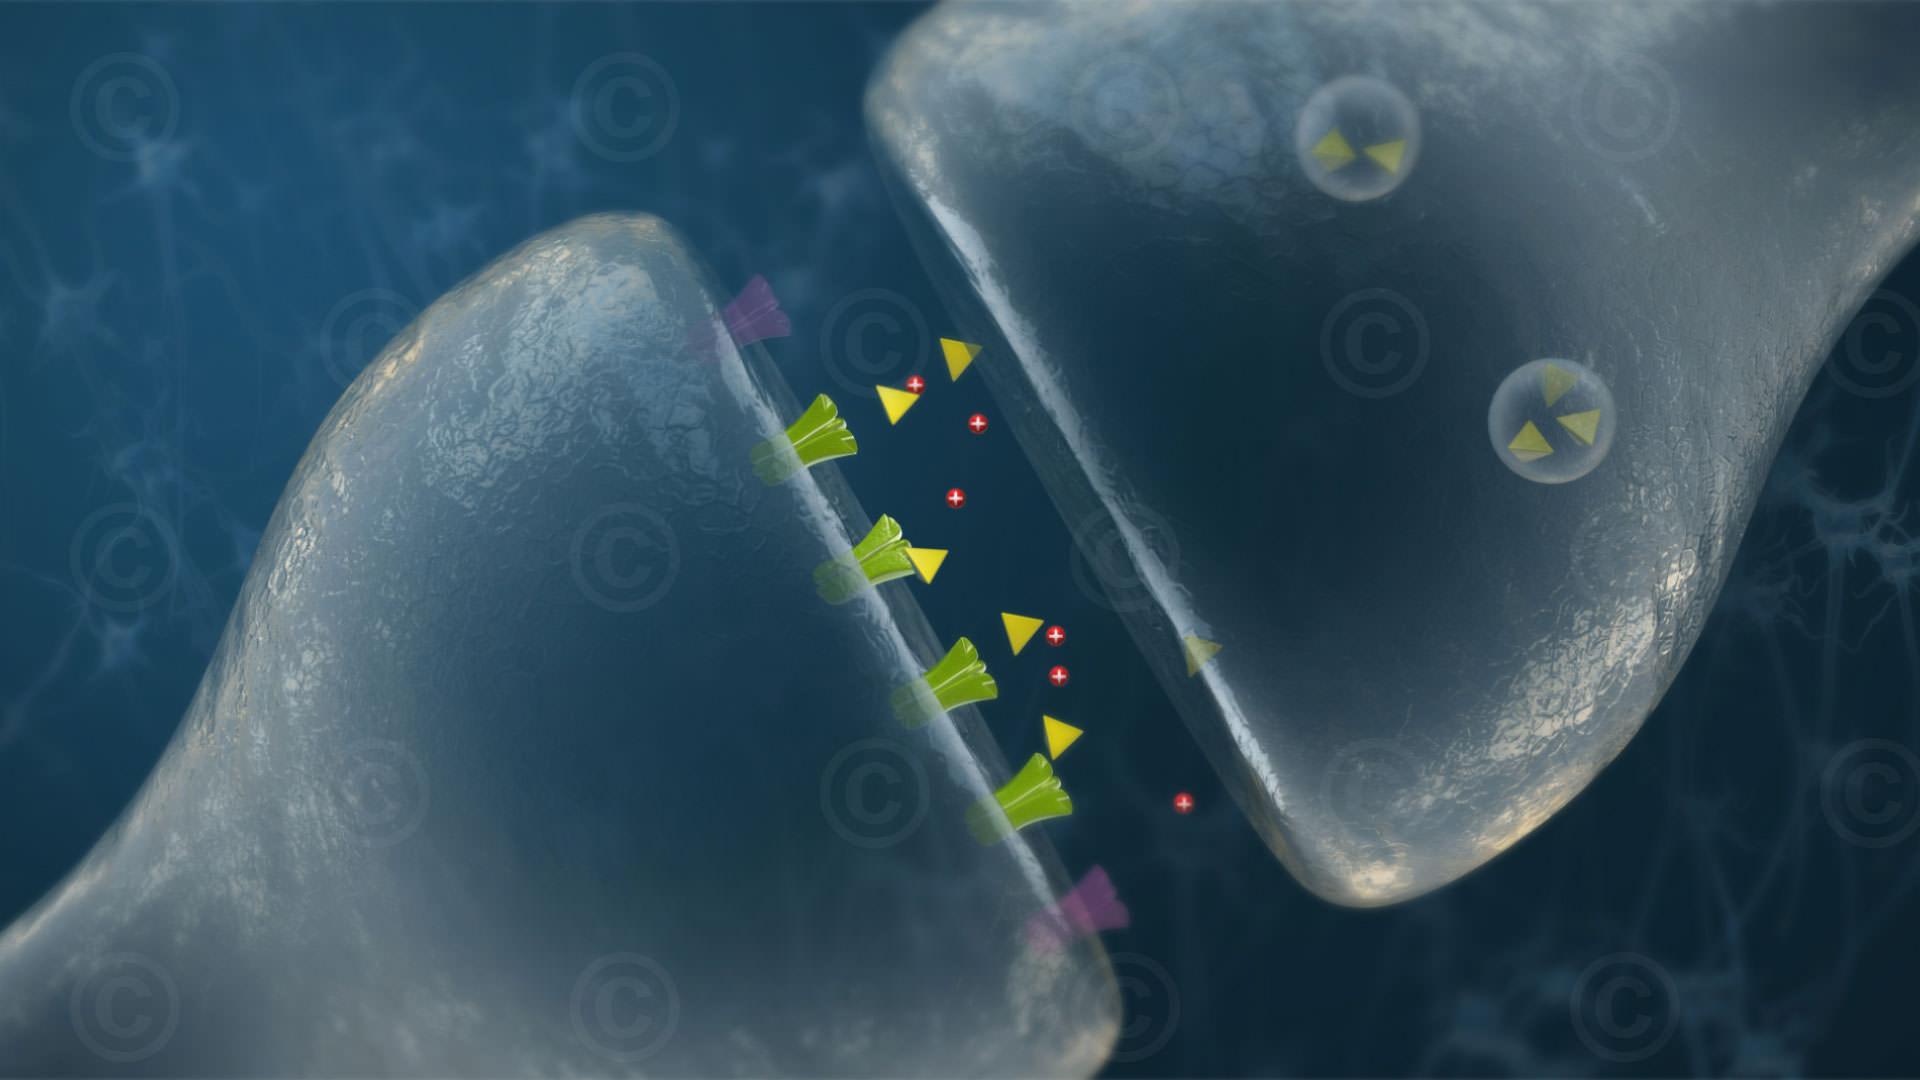 Transmitter am Synapsenspalt